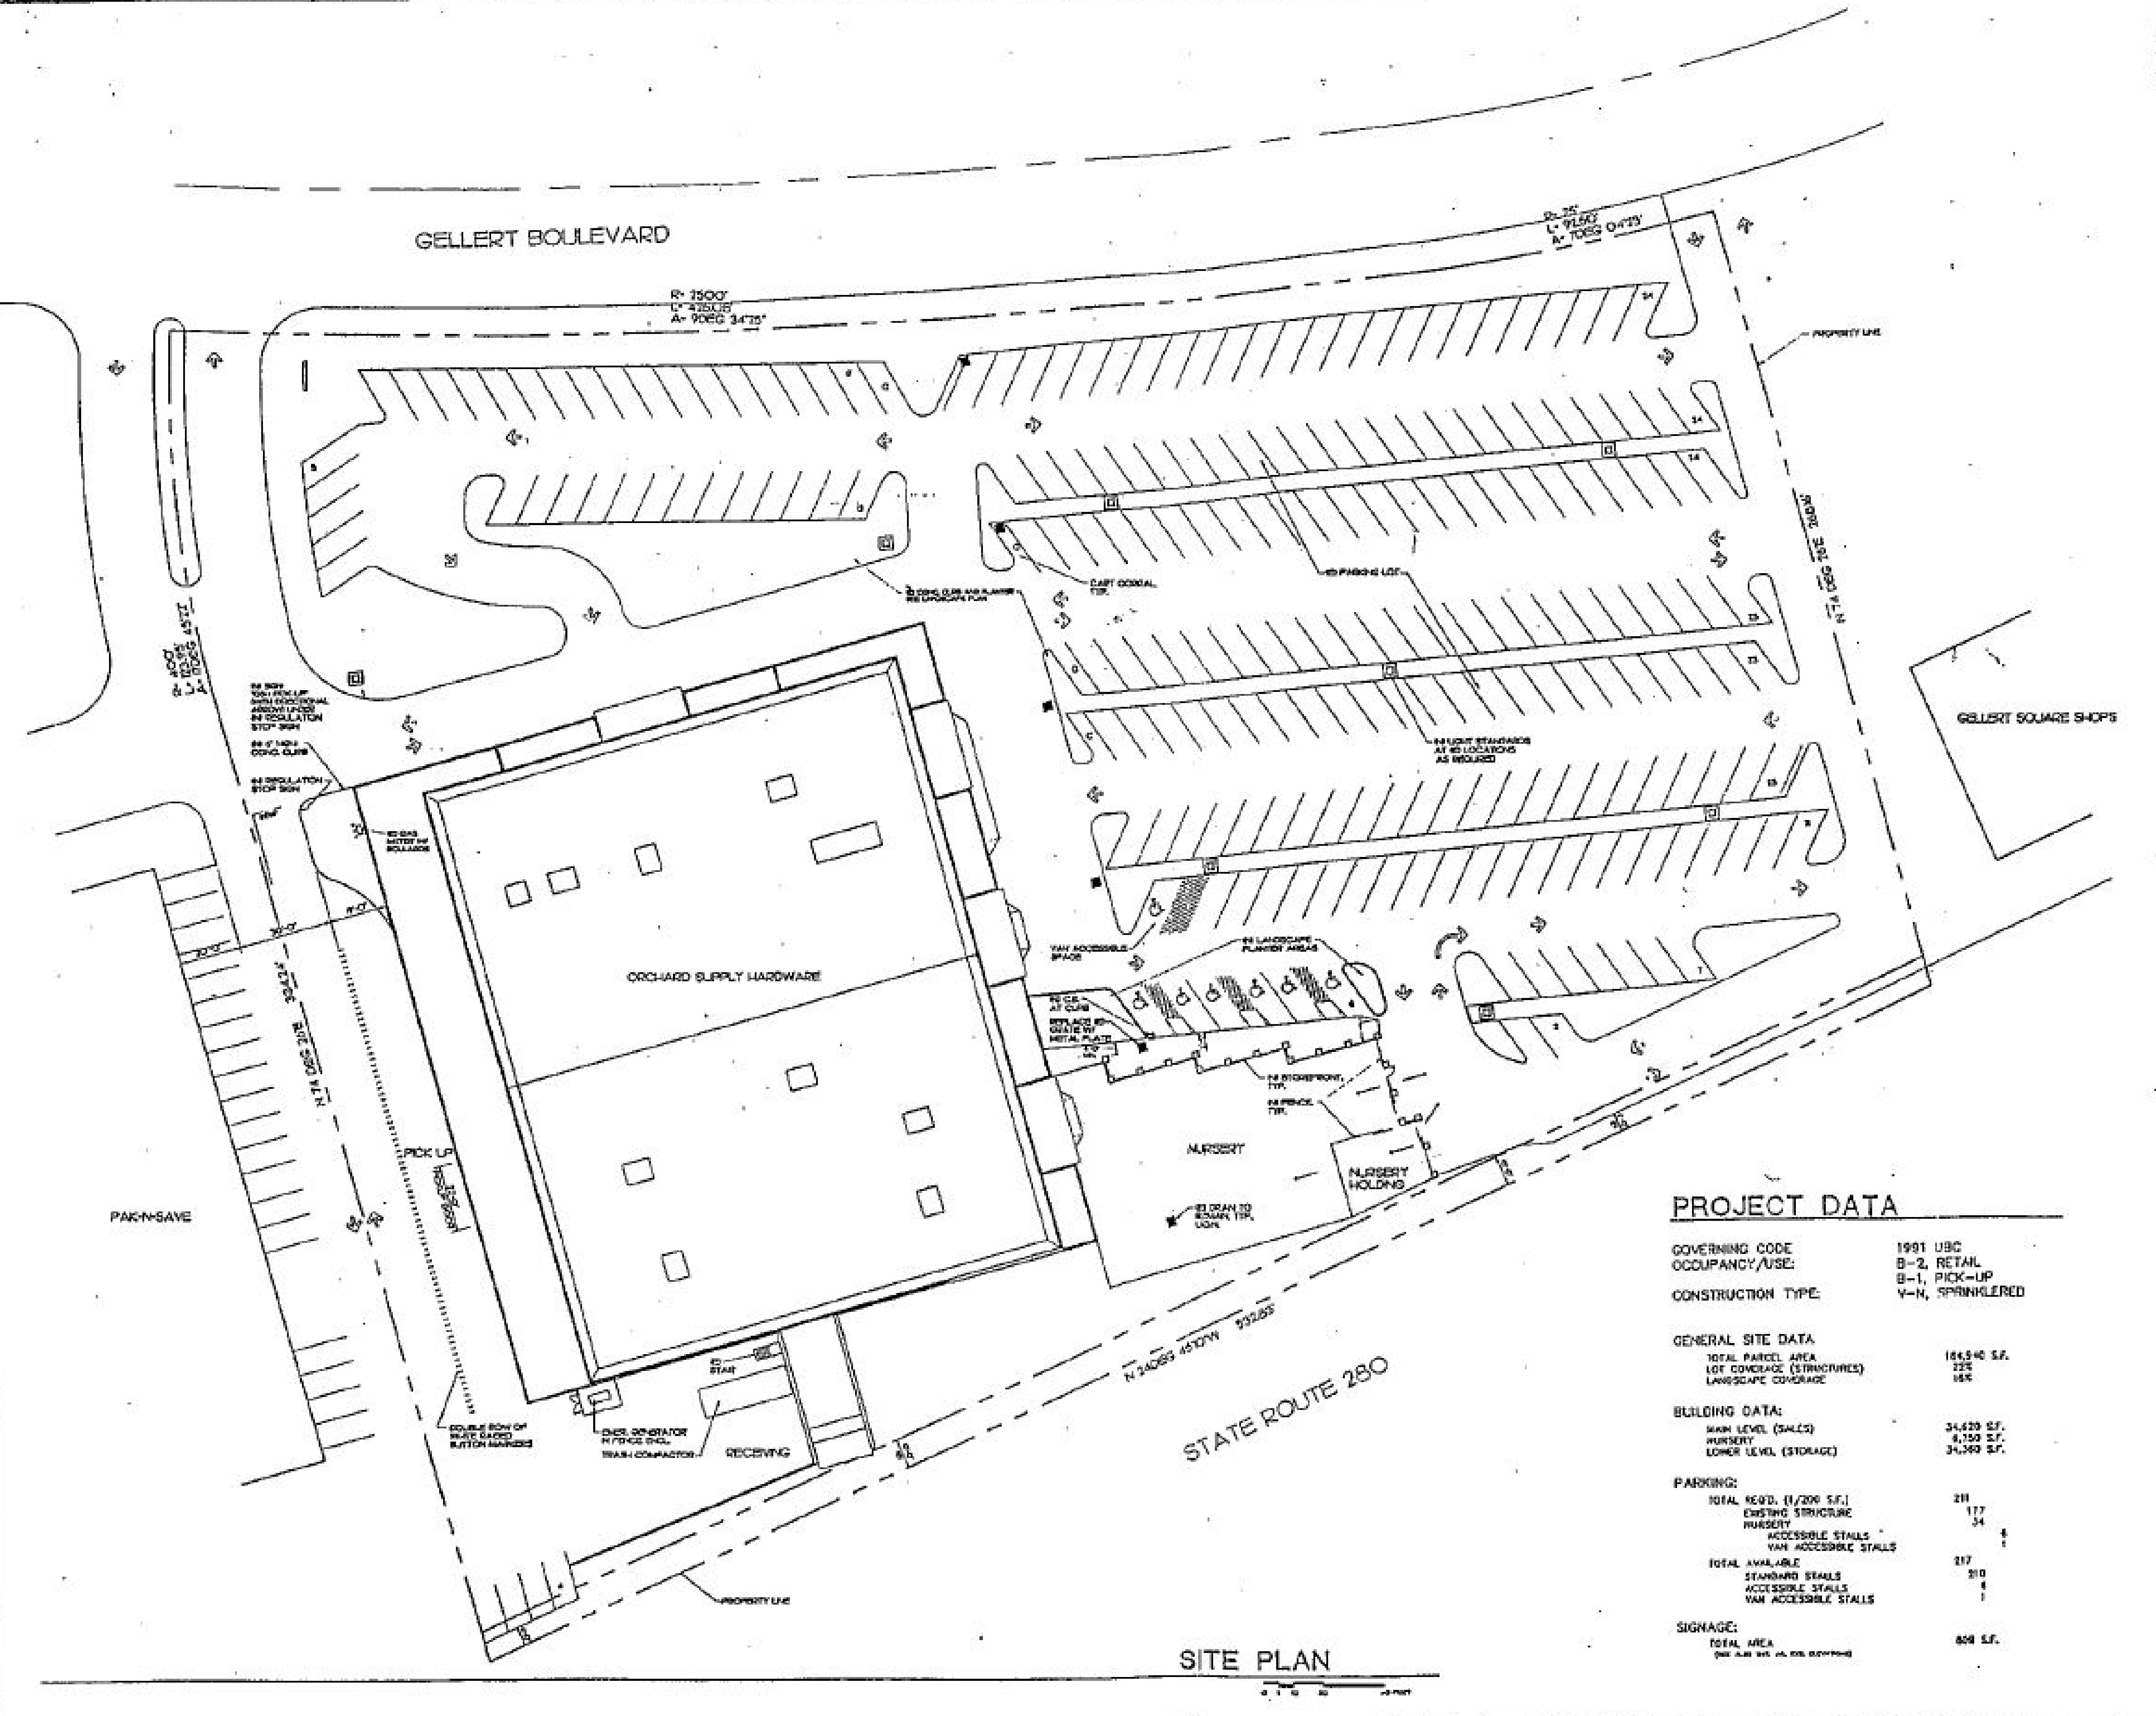 Gellert Marketplace: site plan